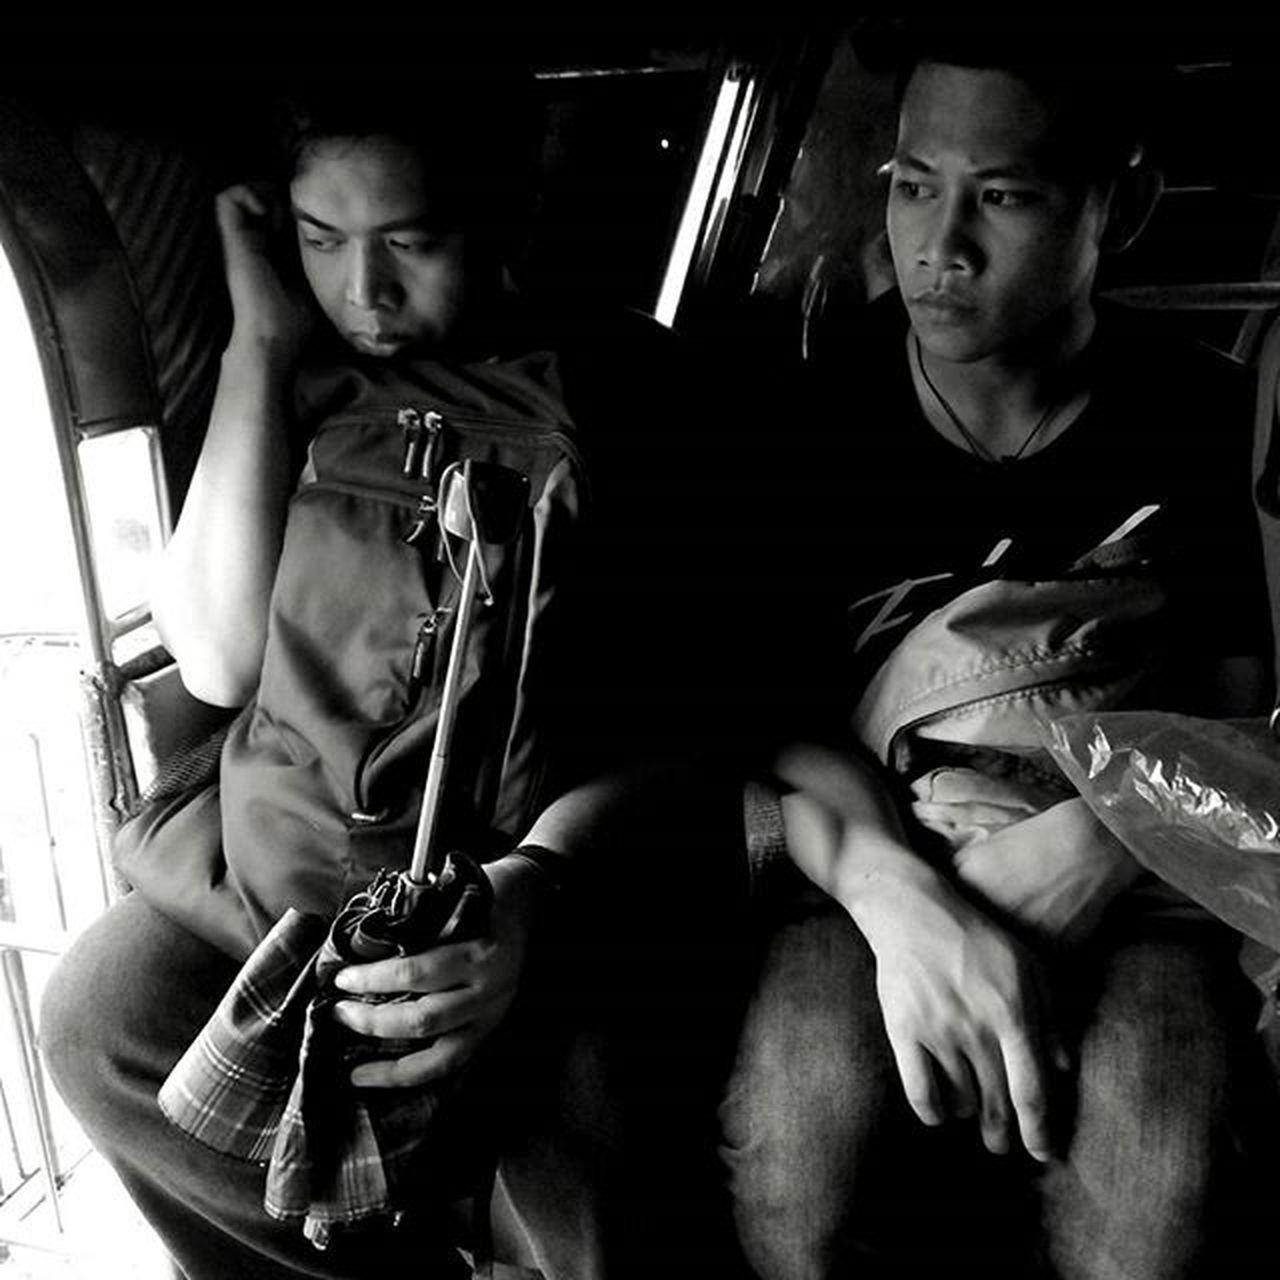 Jeepney passengers. People Passengers Jeepeney Ride Transportation Blackandwhite Monochrome Manila Emotions Philippines Eyeem Philippines Expressions Urban The Commute Everyday Emotions